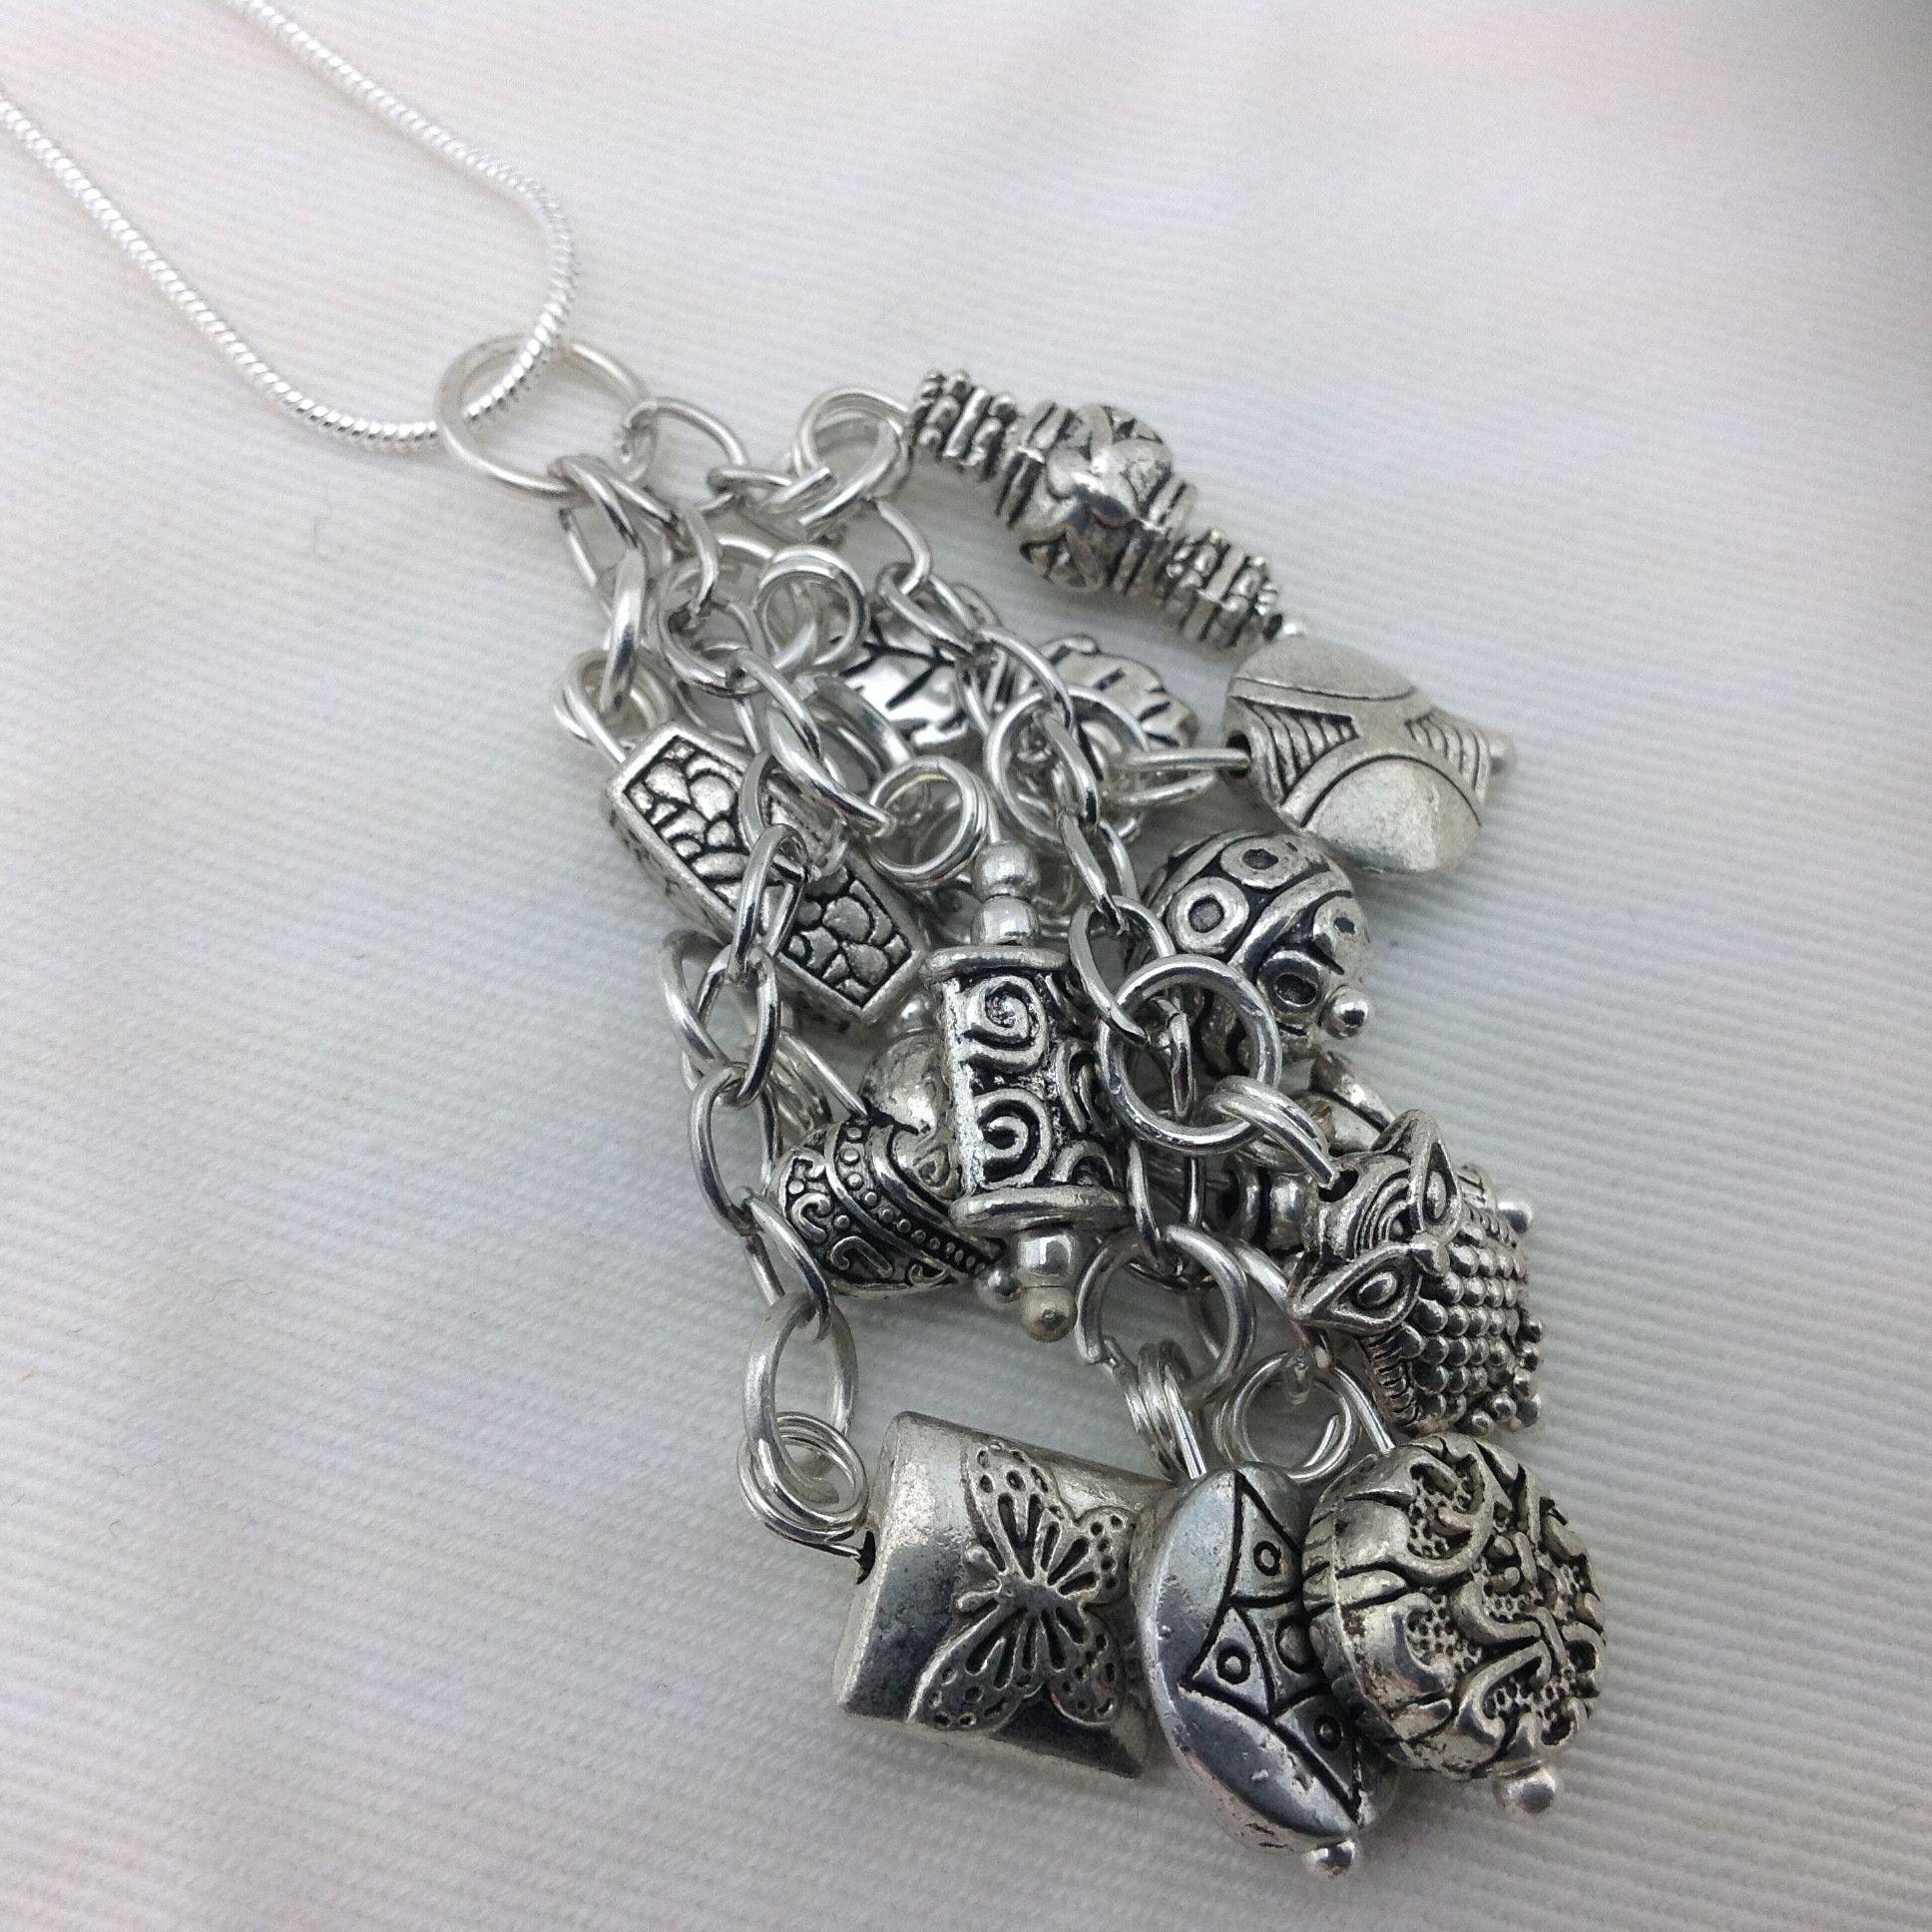 Tibetan Silver Charm Necklace